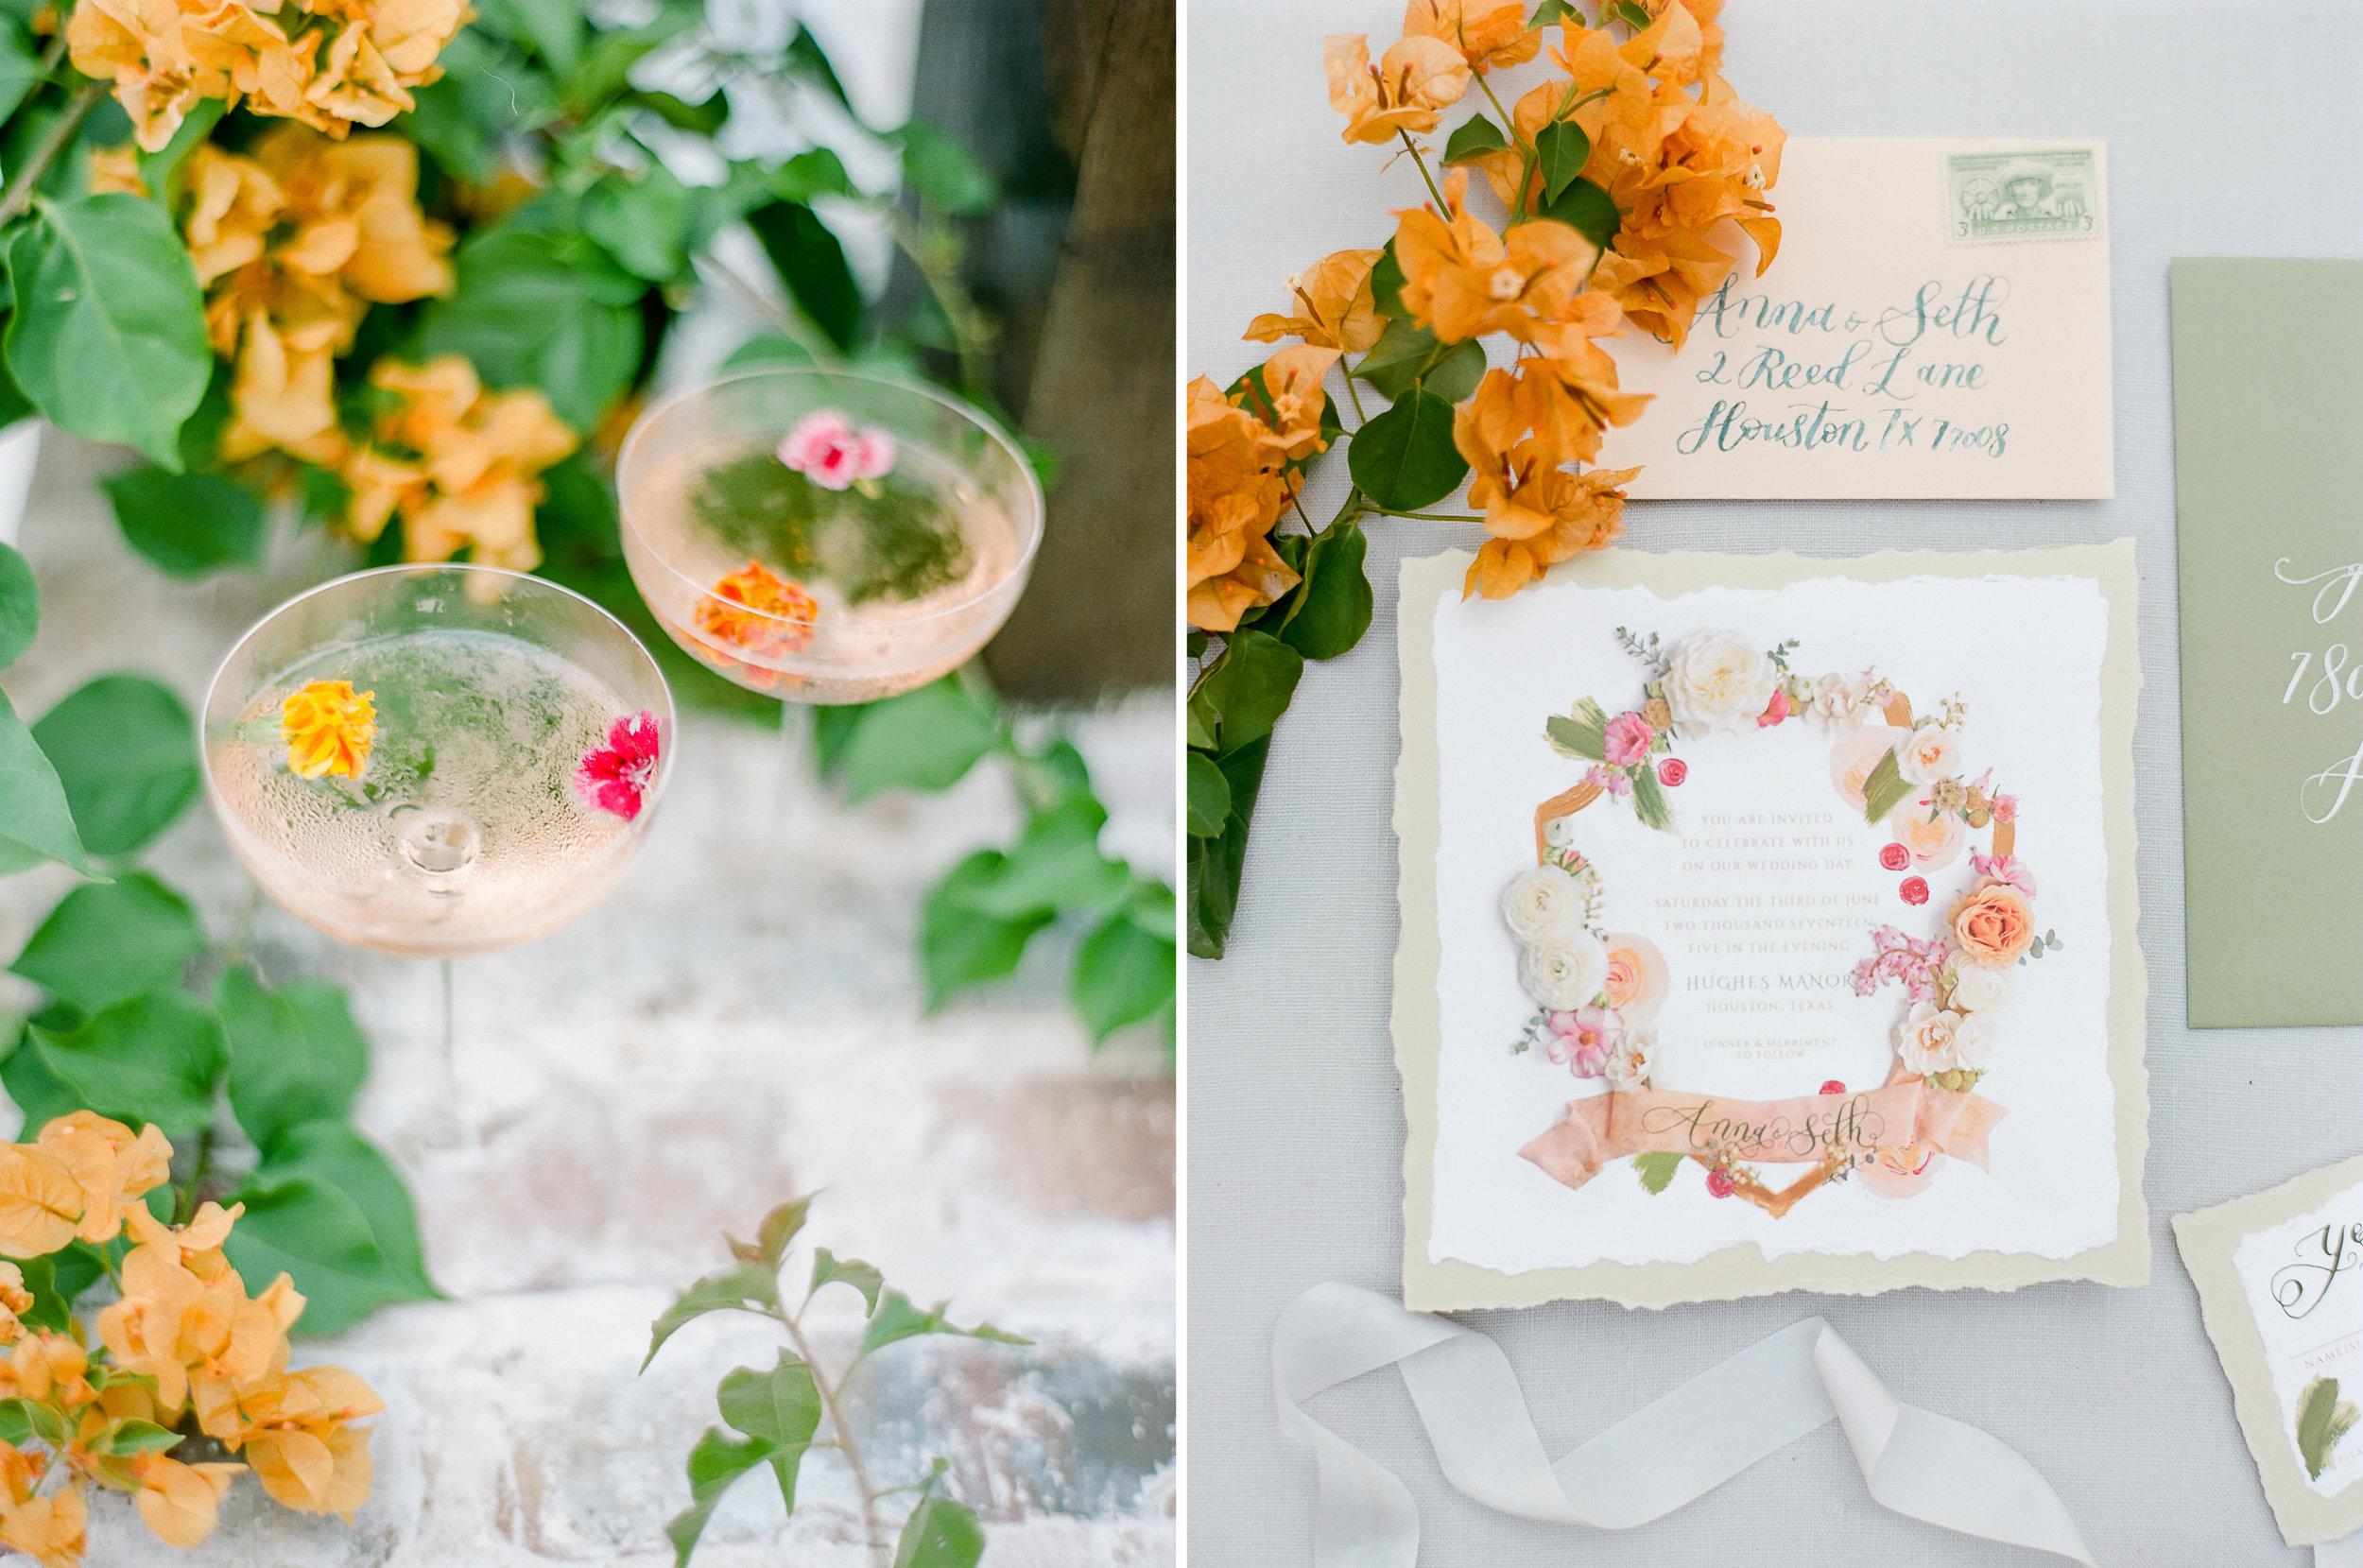 Houston-Wedding-Photographer-Fine-Art-Film-Destination-Style-Me-Pretty-Austin-Dallas-New-Orleans-Dana-Fernandez-Photography-106.jpg